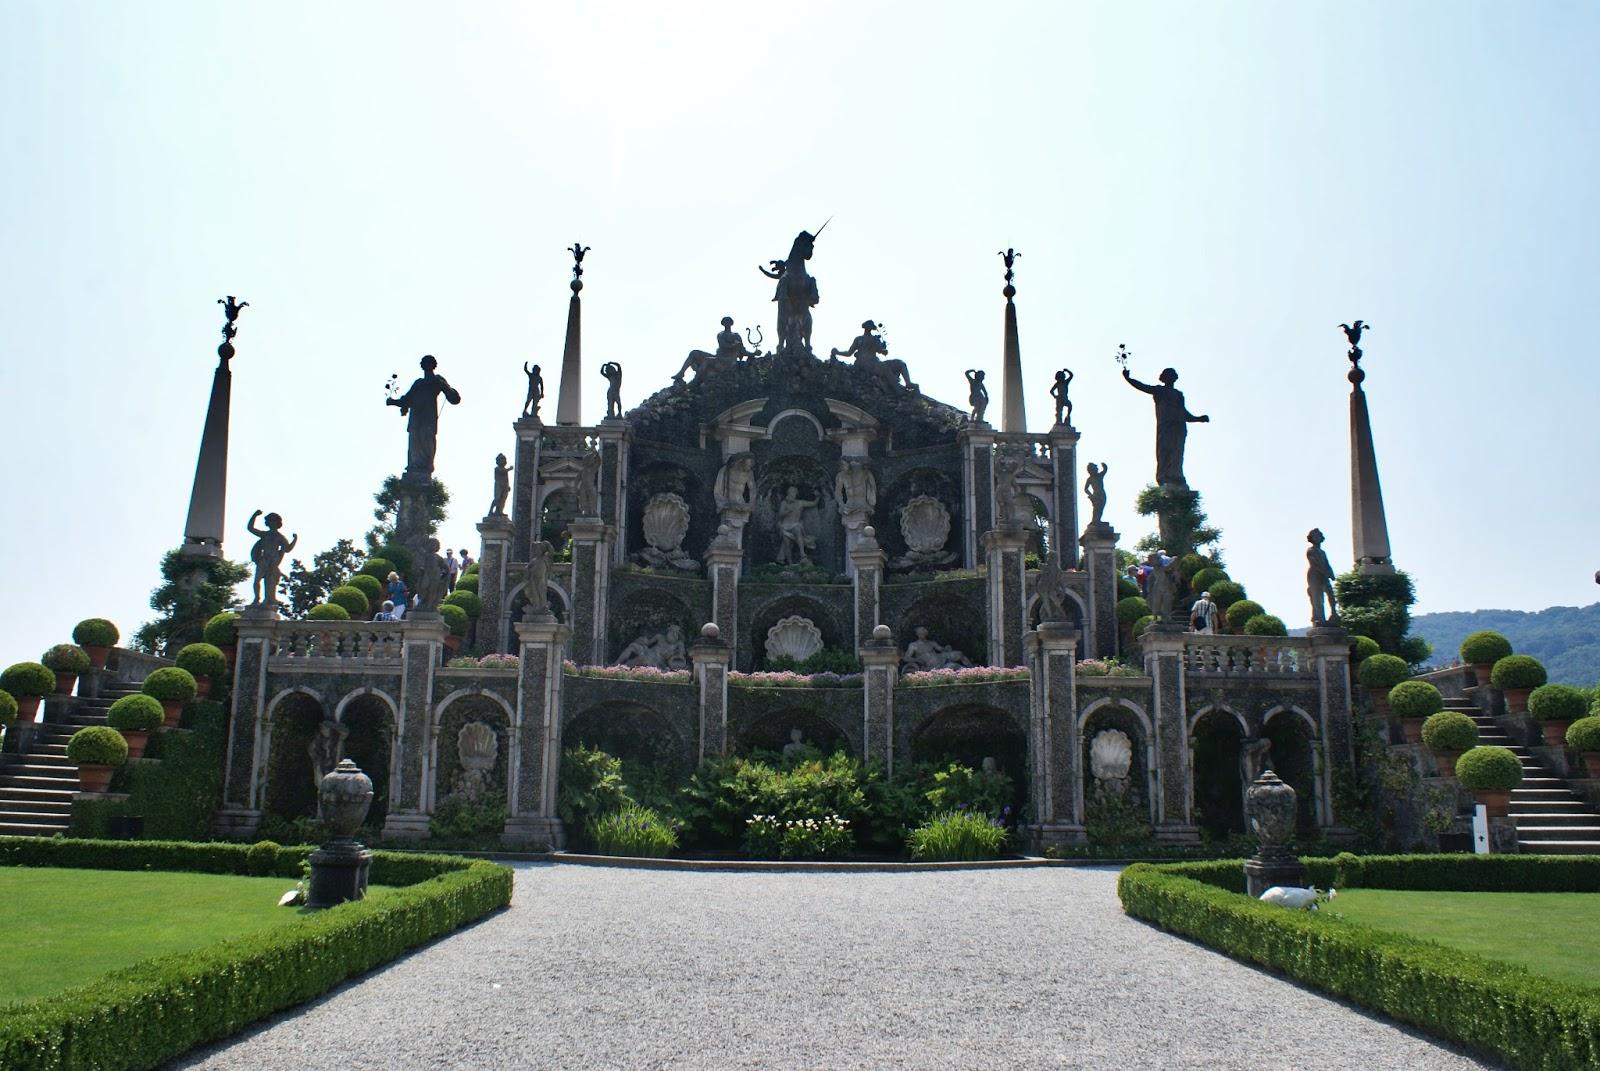 garden giardino isole borromee borromées isola bella lago maggiore piemonte italy teatro massimo